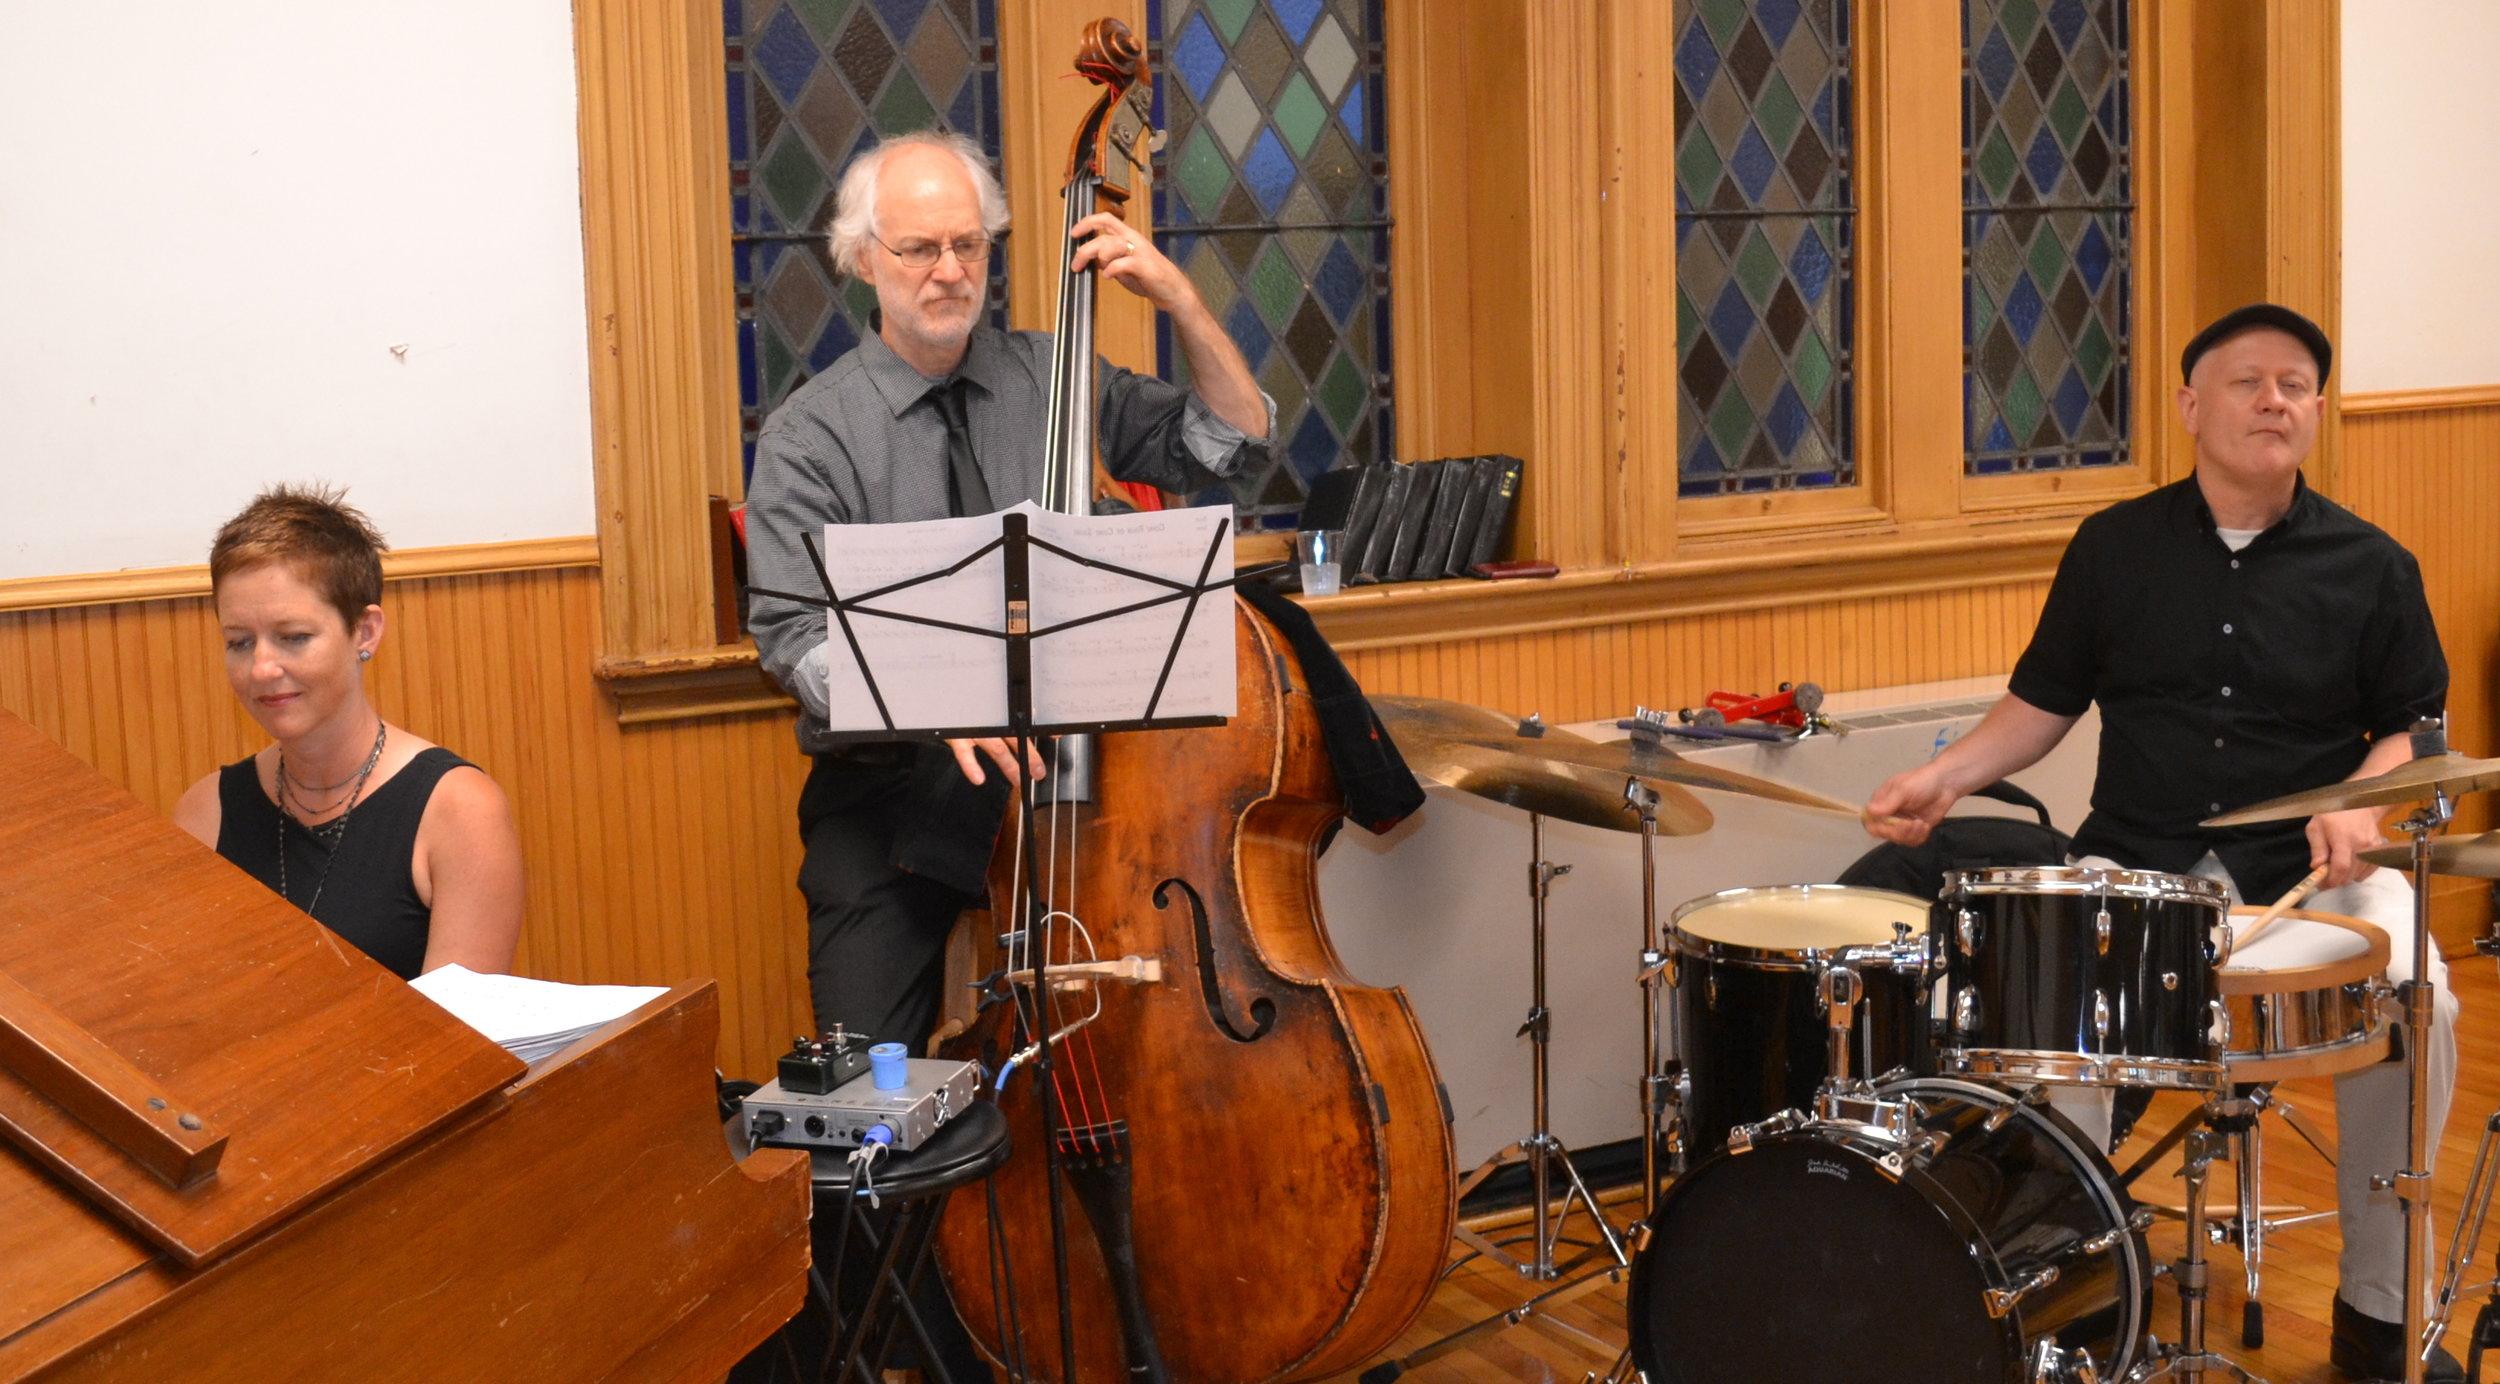 BFU members Rebecca Cline, Dave Clark, and Bertram Lehmann performing at the ESWA event